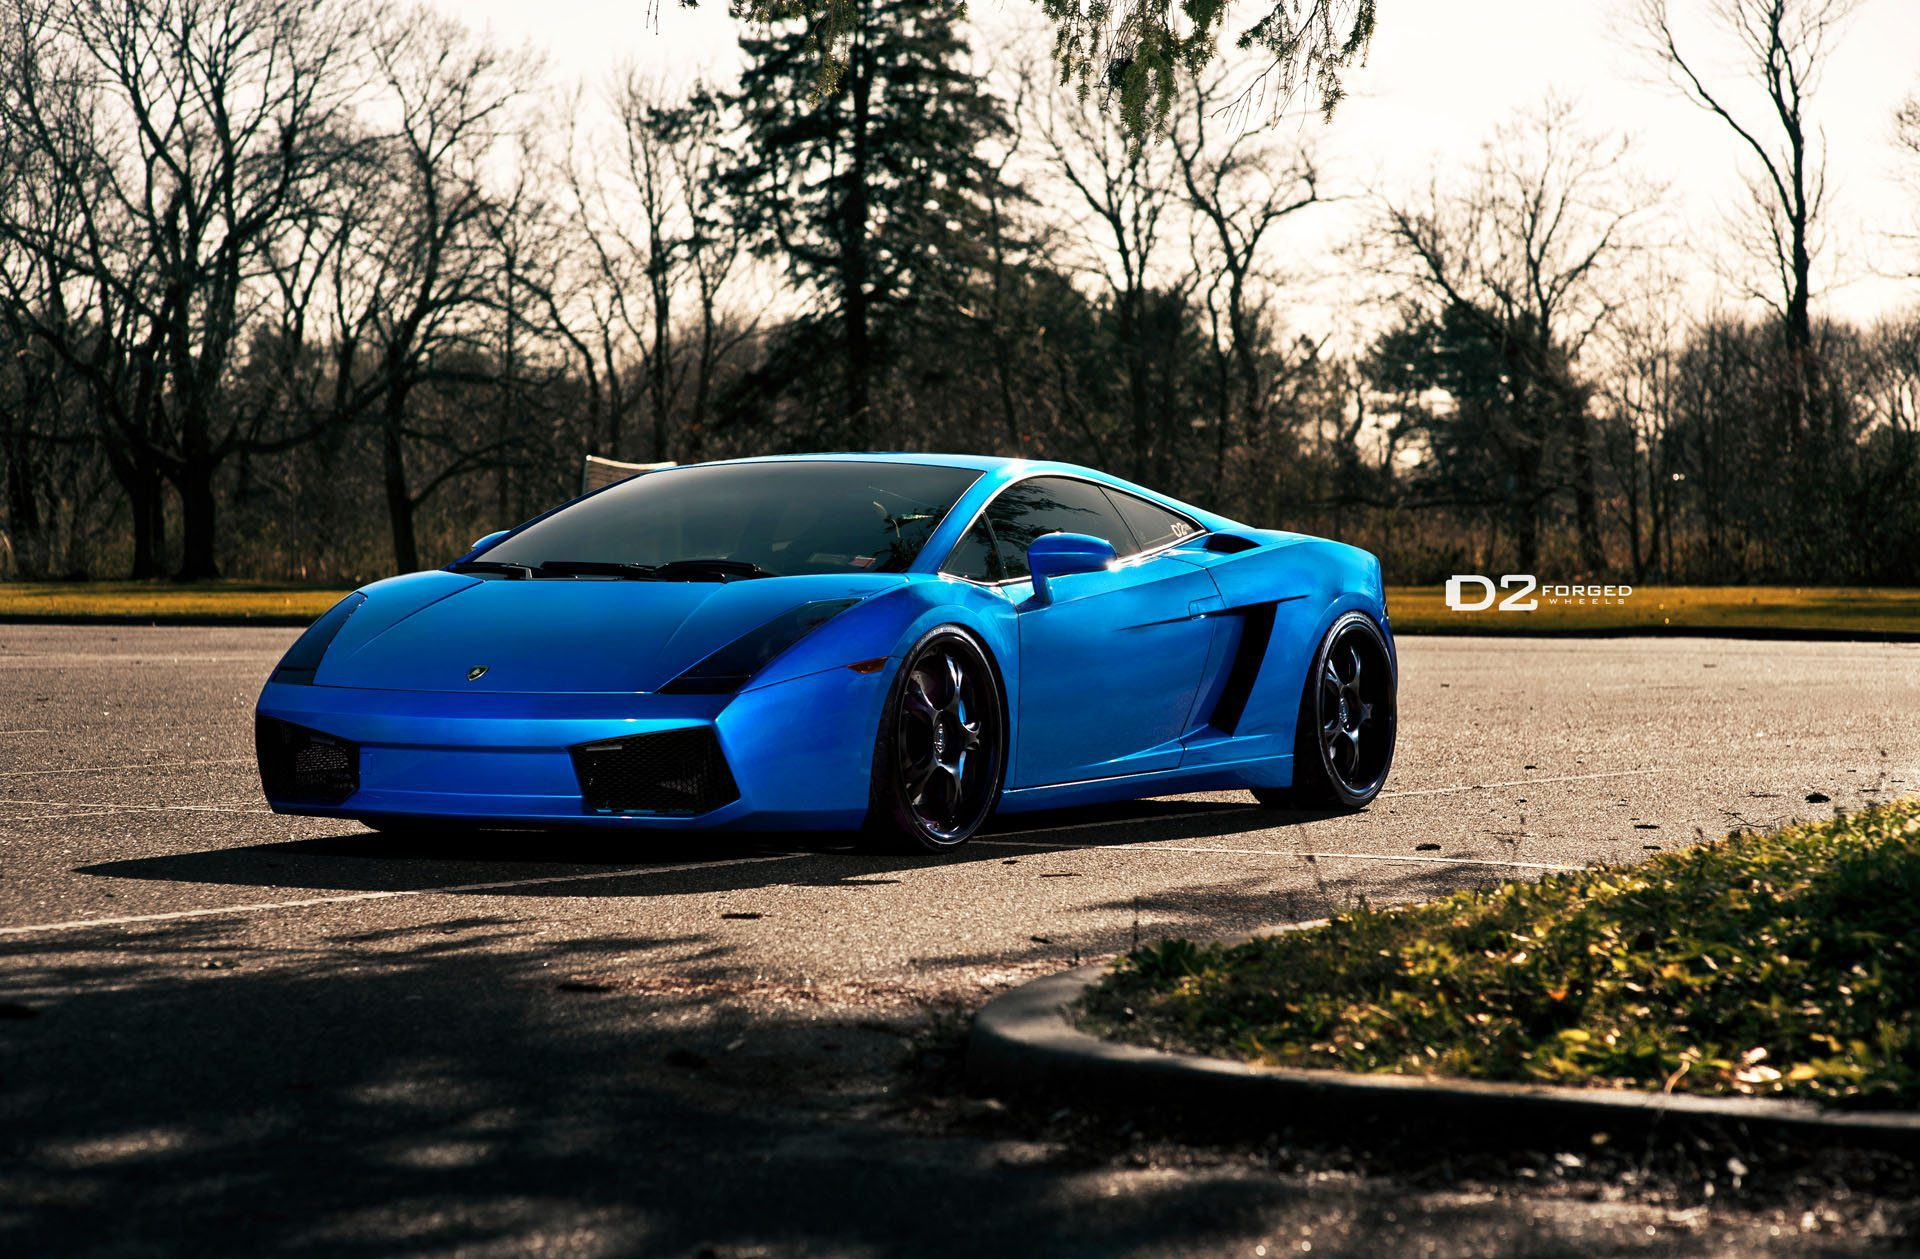 Blue Perfection From D2forged Lamborghini Gallardo Shoot